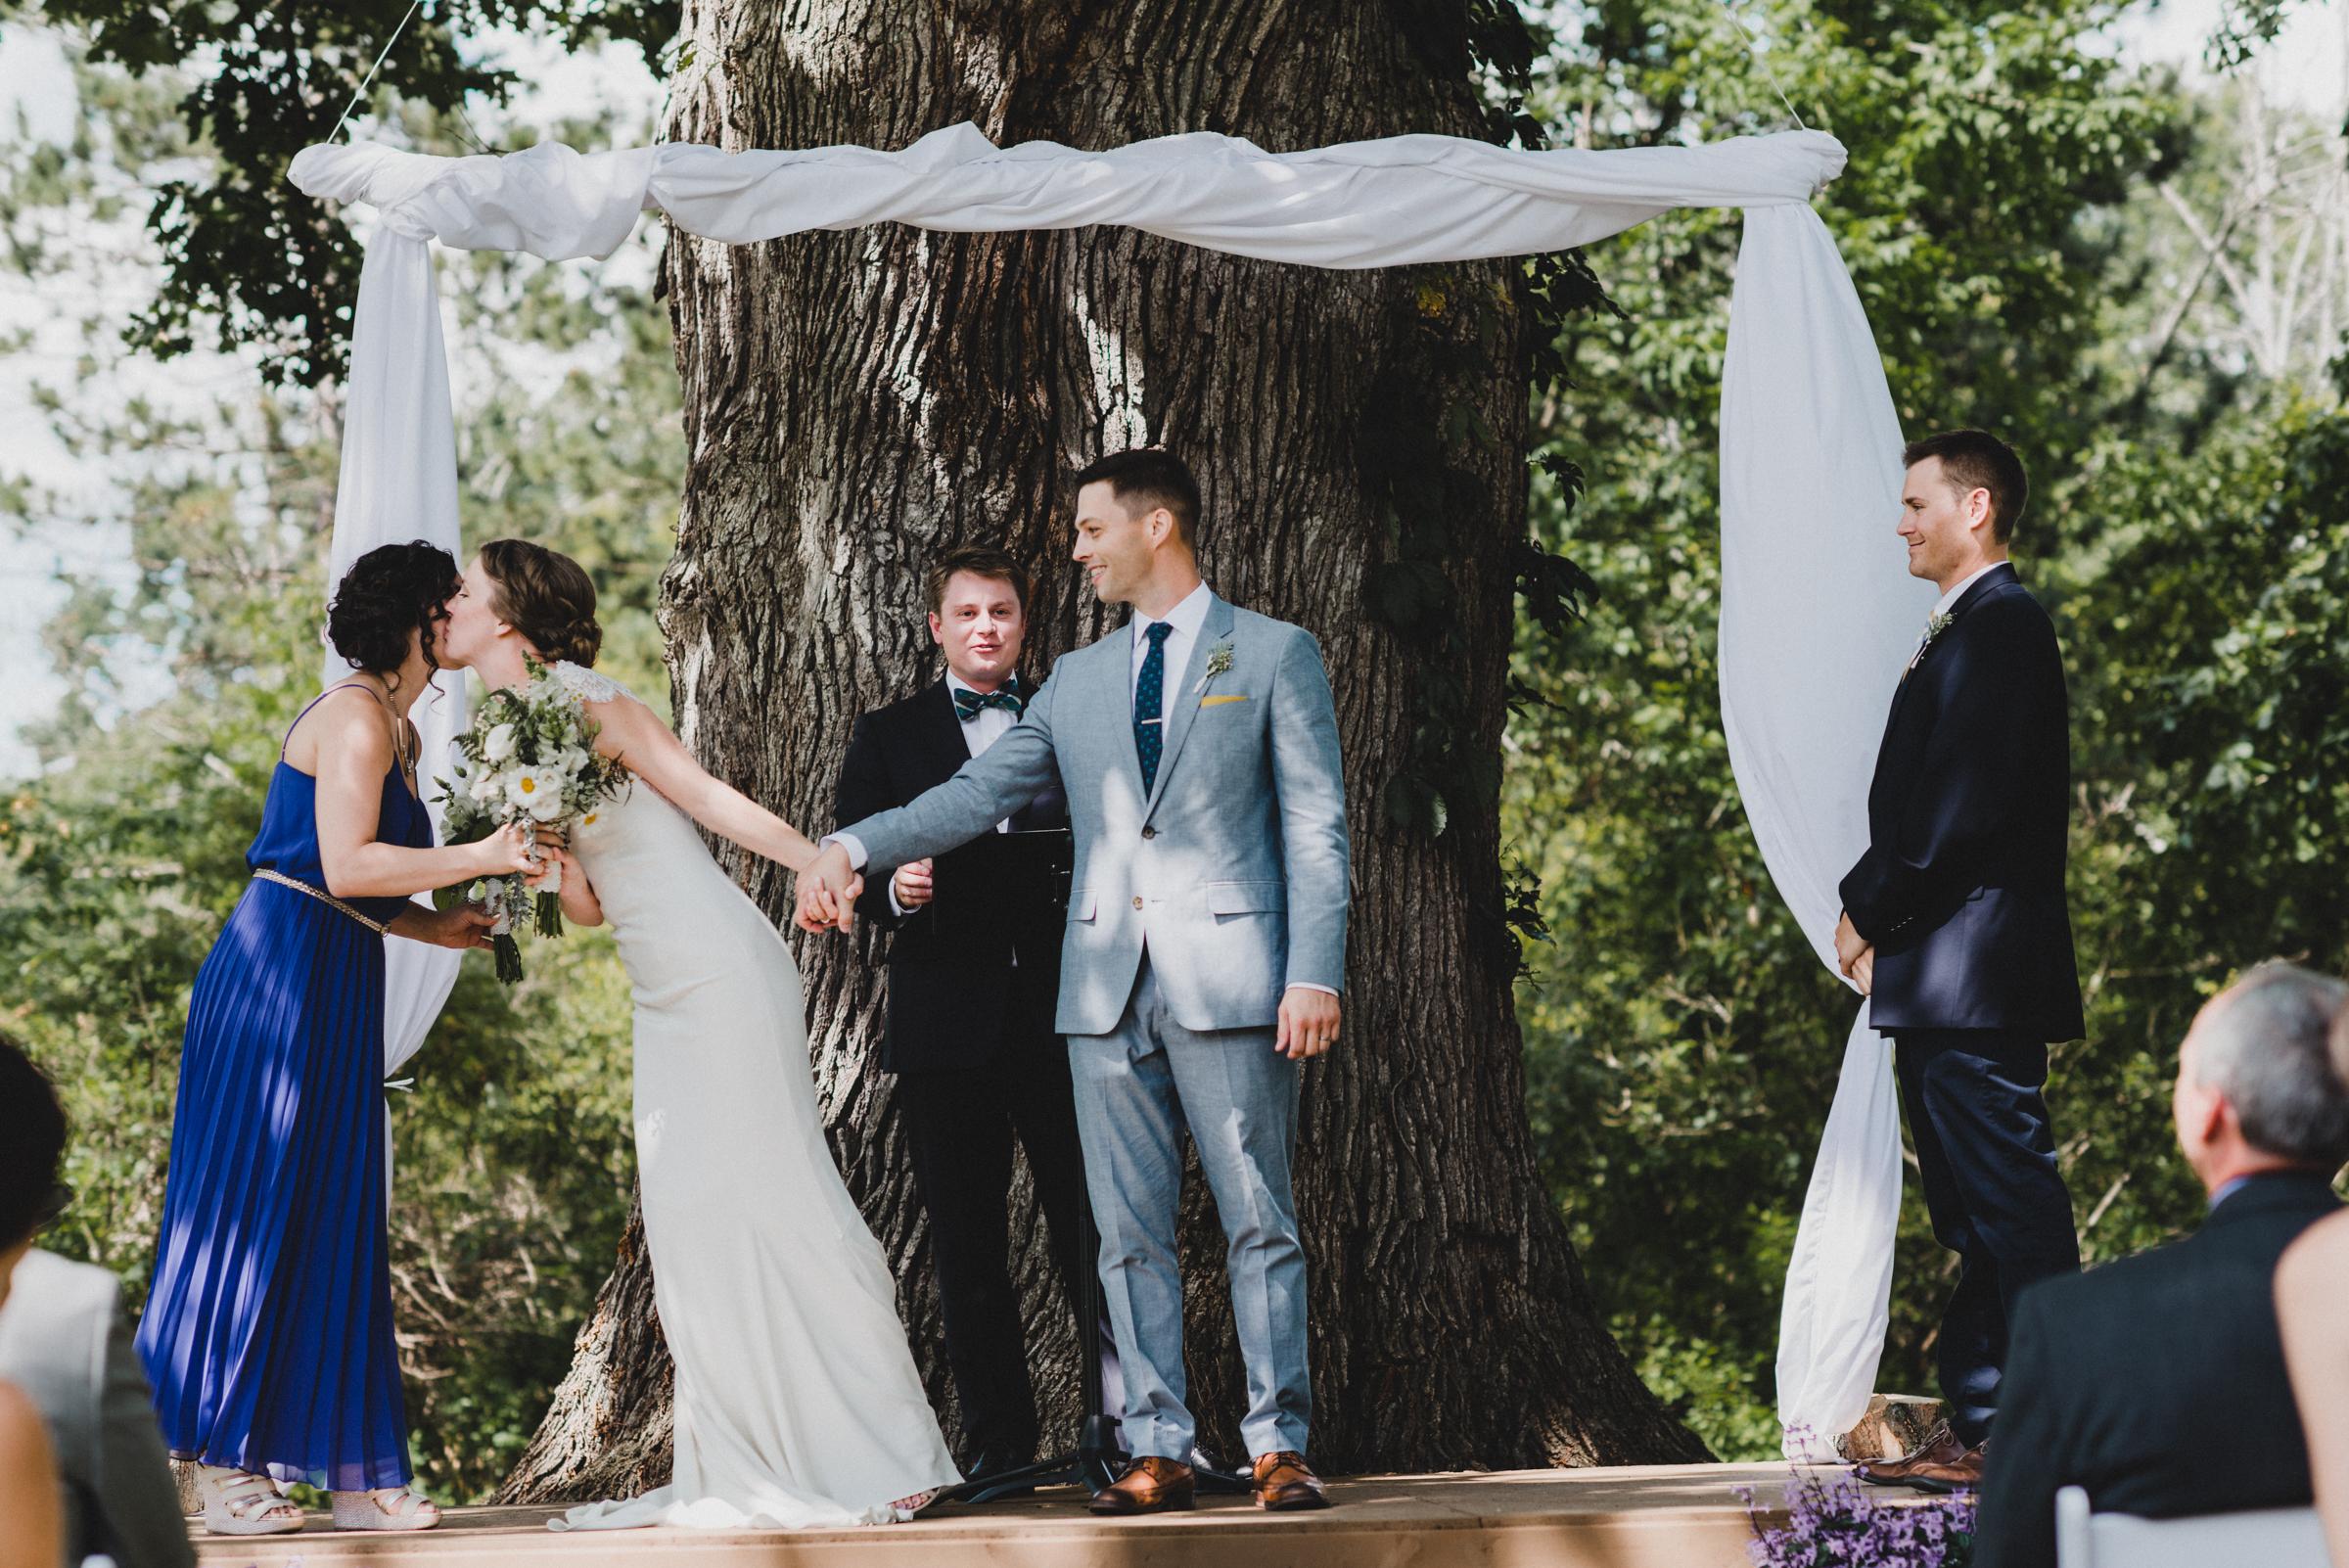 Intimate-Backyard-Farmhouse-Ohio-Wedding-Andi+Ben_Mallory+Justin-Photographers-168.JPG